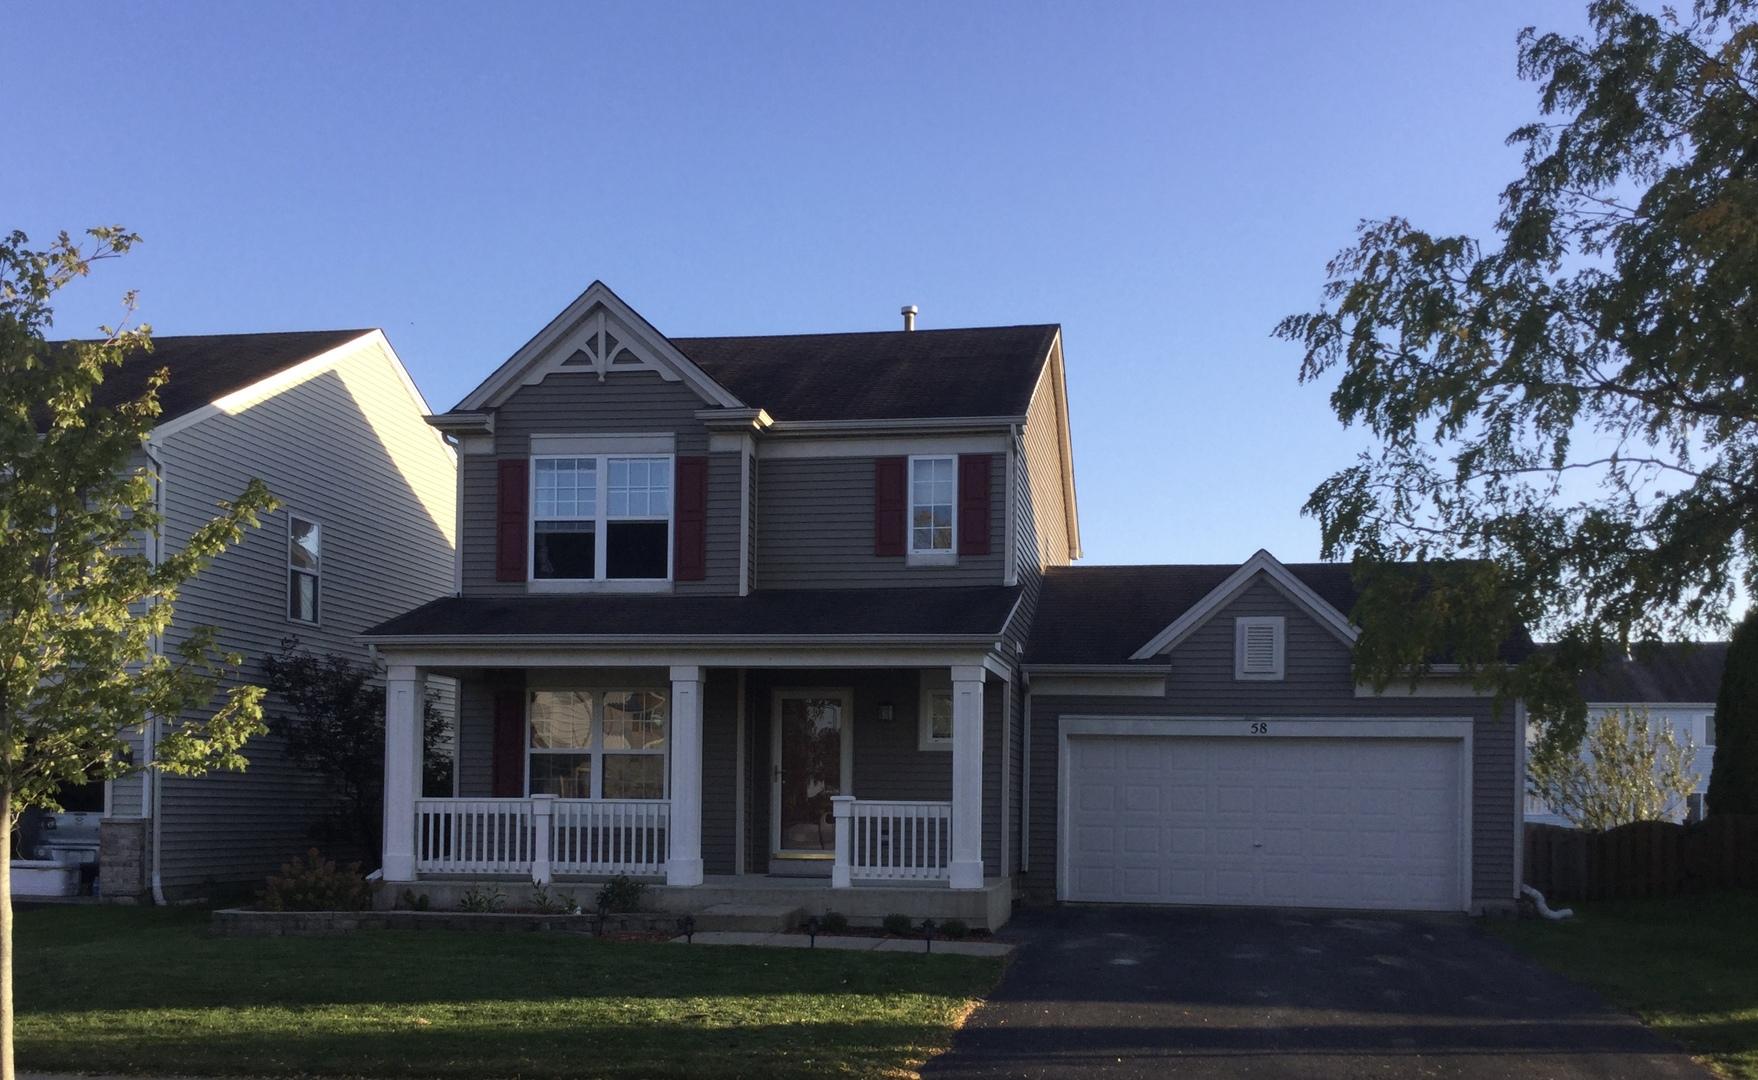 58 East Clover, Cortland, Illinois, 60112